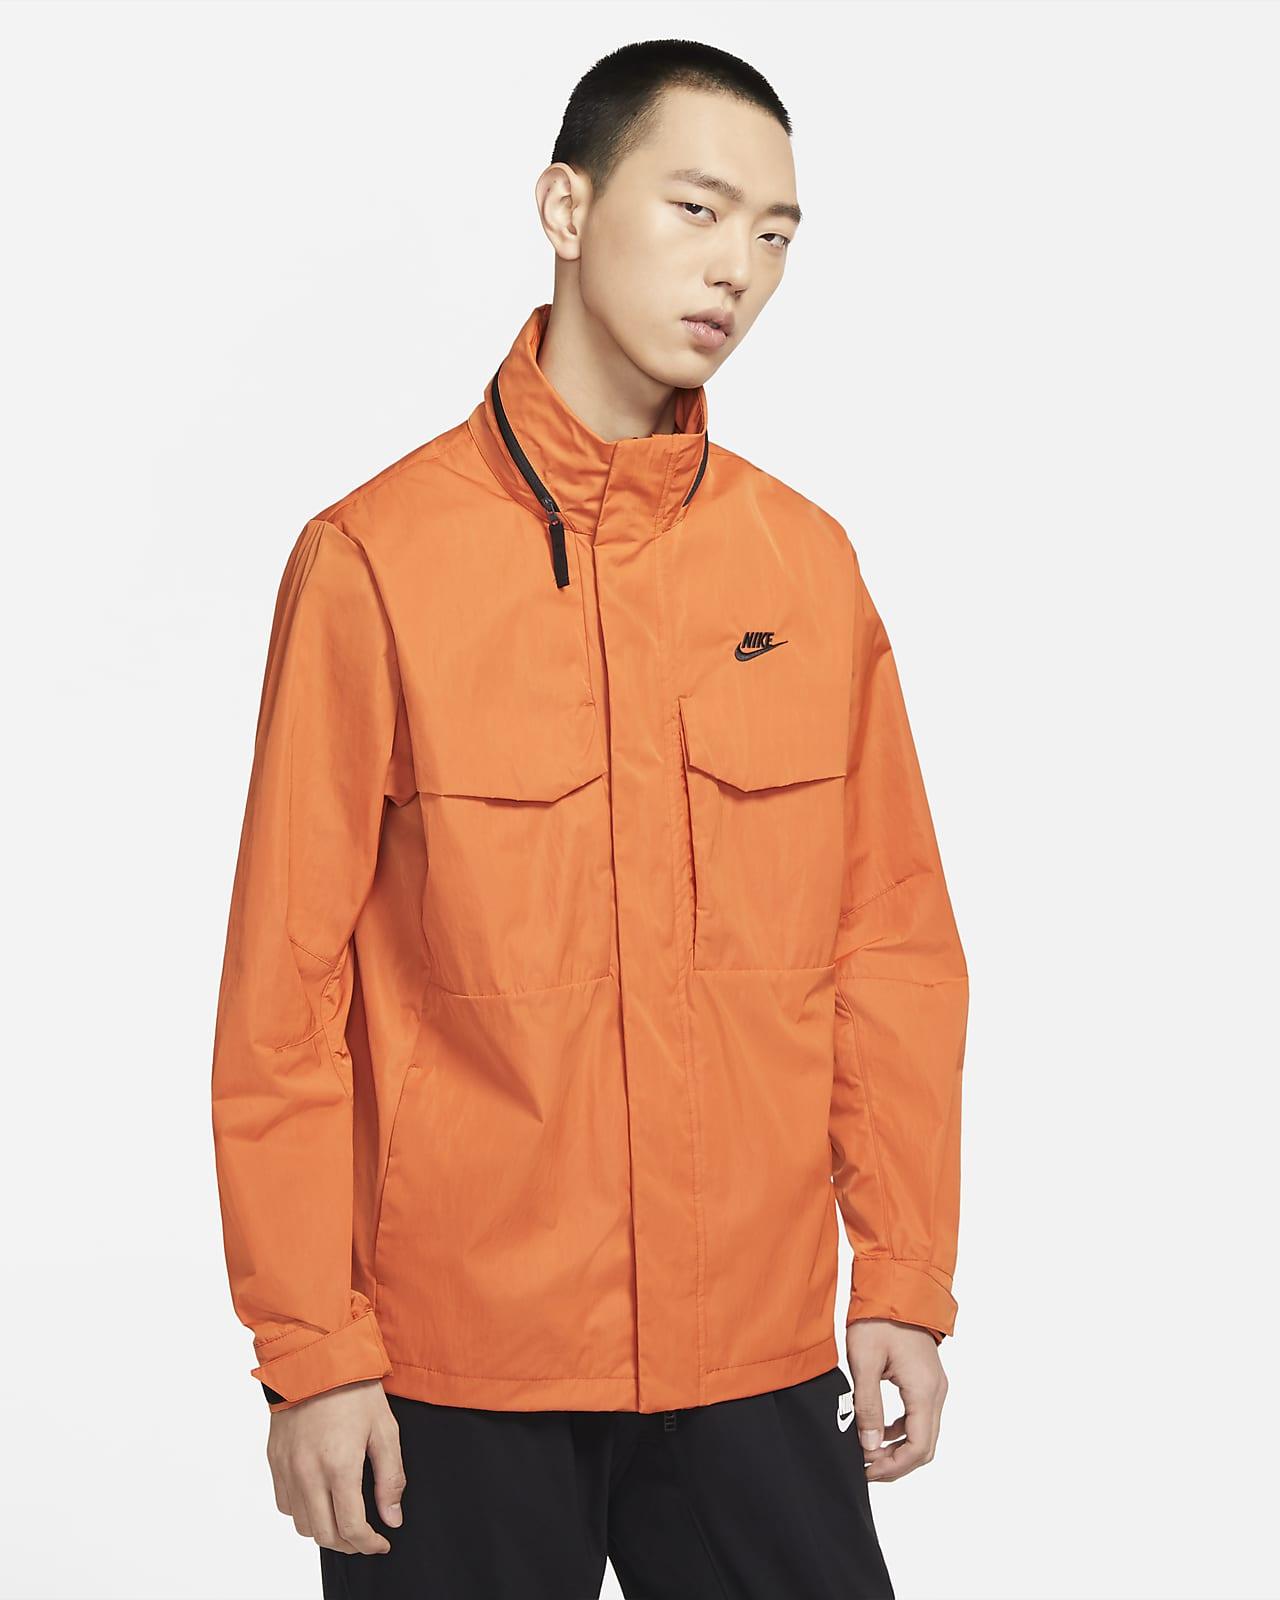 Nike Sportswear Premium Essentials M65 Unlined 男子连帽夹克